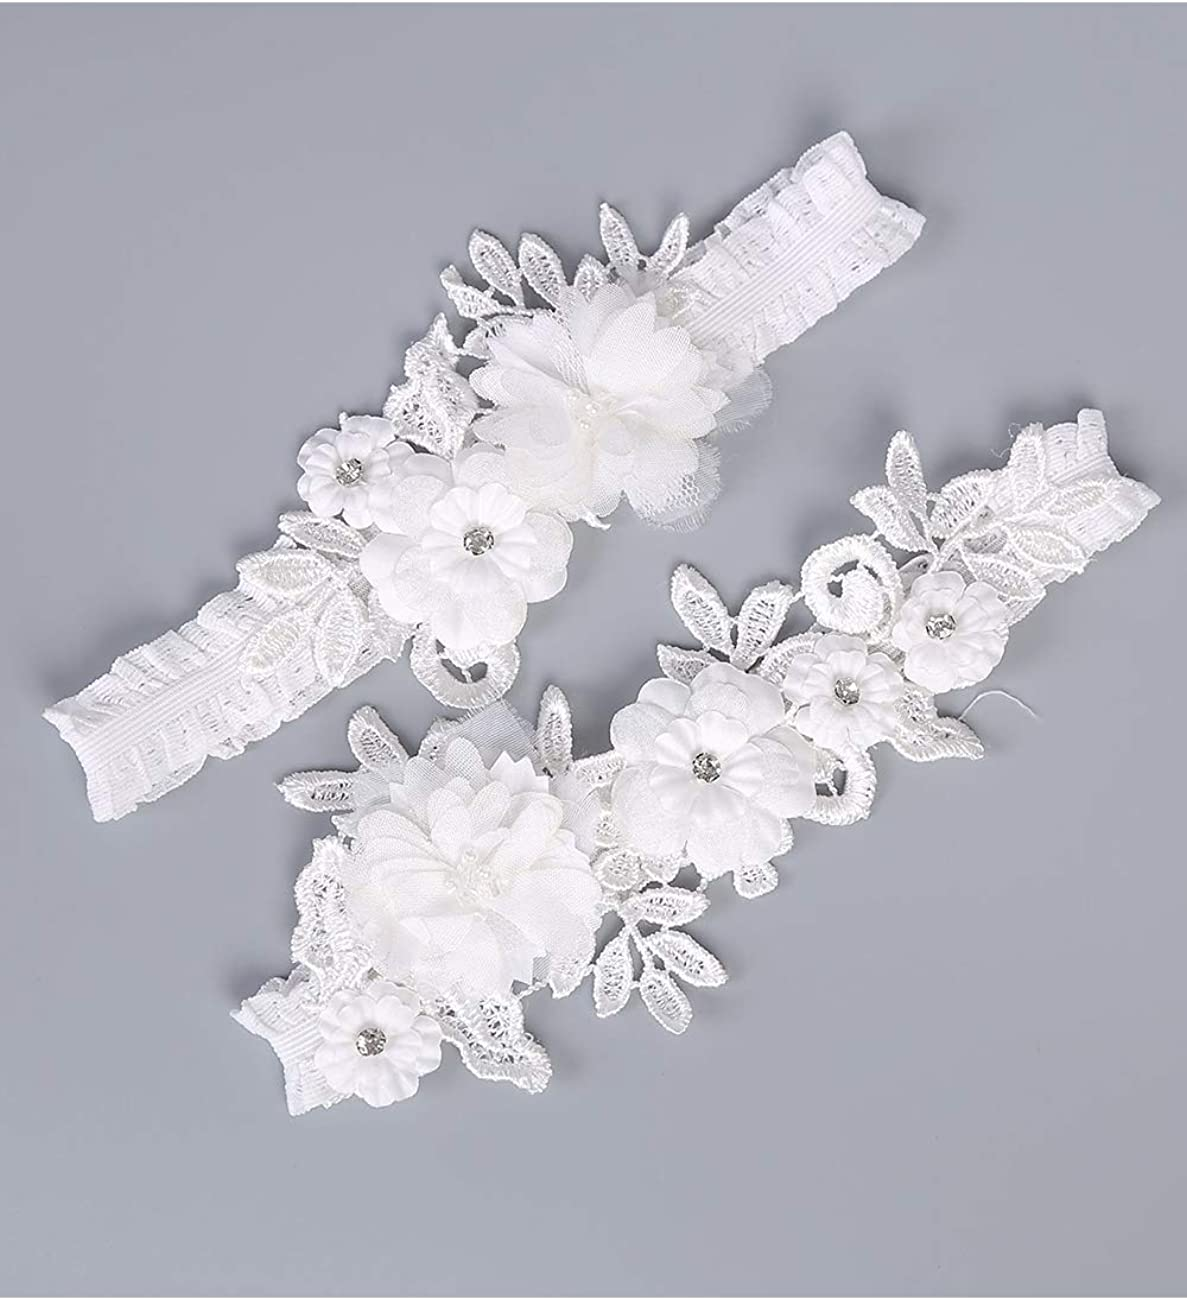 Womens Wedding Bridal Garters Rhinestone Ivory Lace Wedding Gifts Pack of 2 besbomig